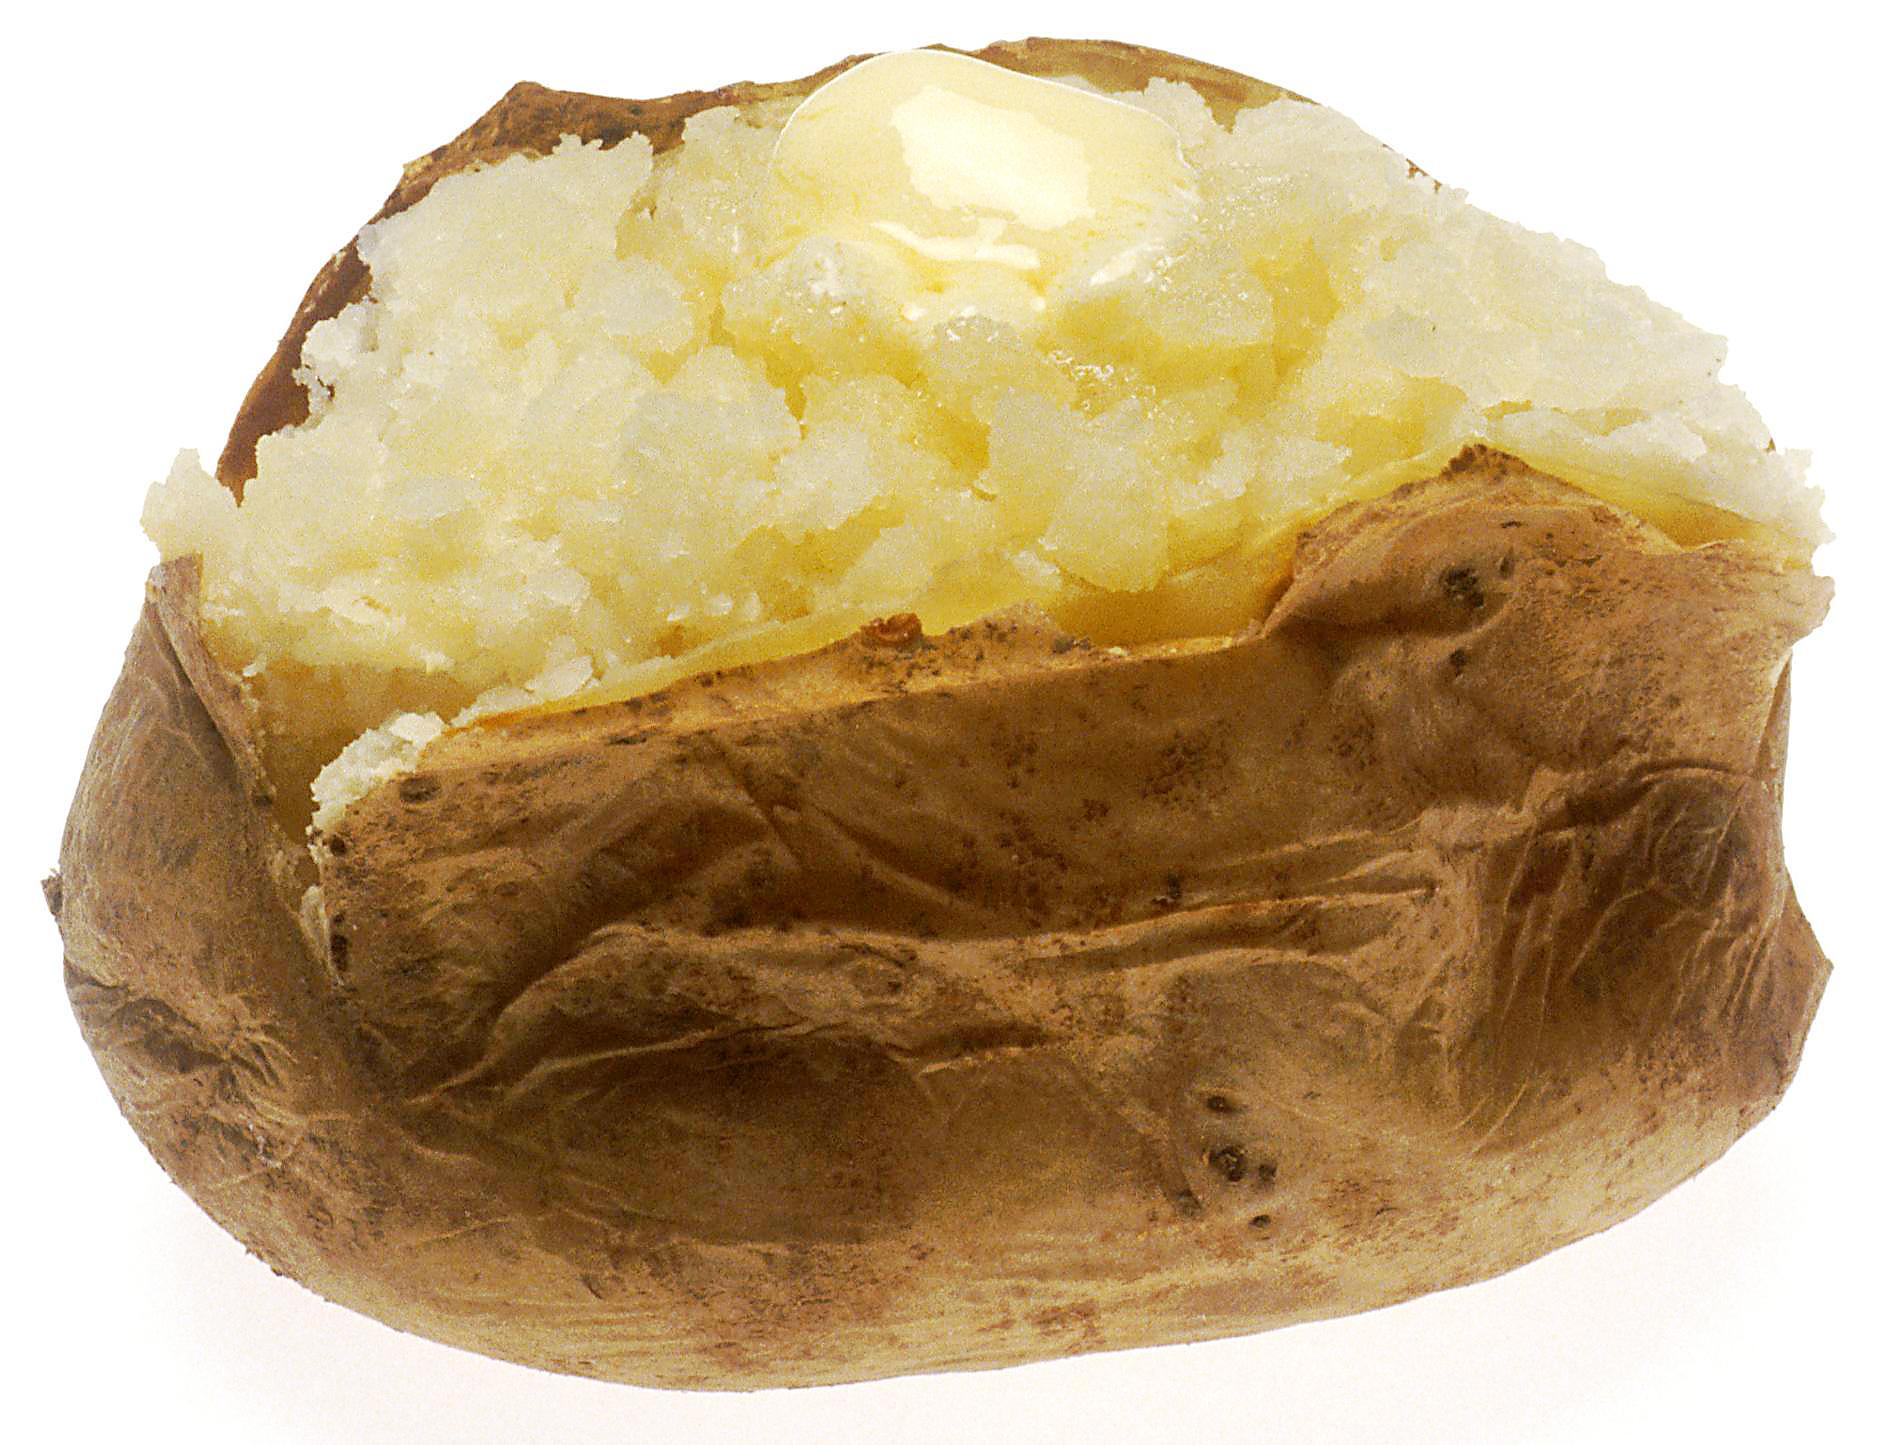 Depiction of Jacket potato